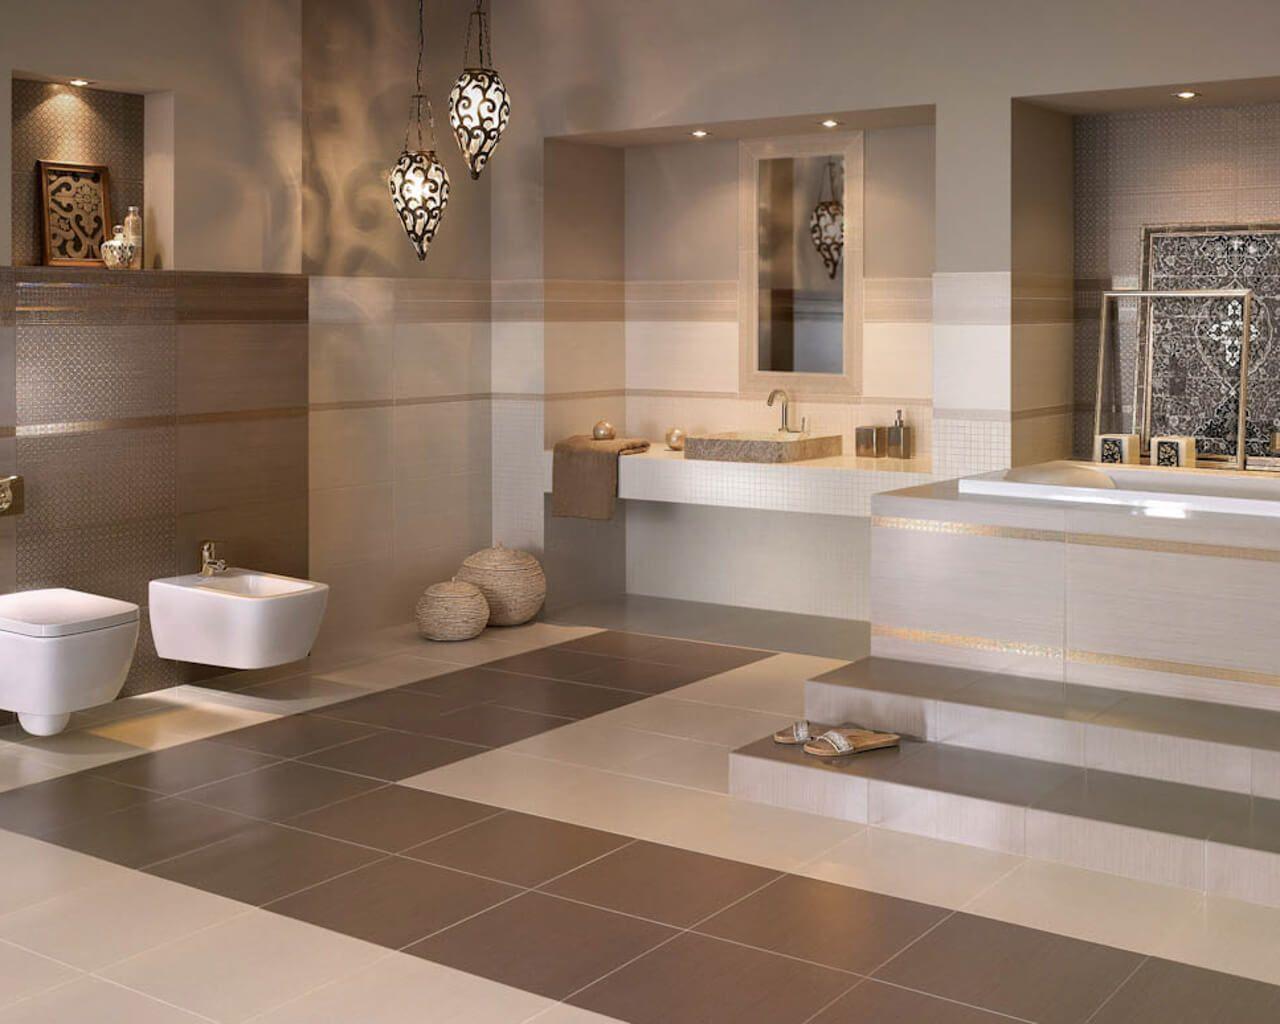 Meisha garam beige bathroom tiles with tiny geometric for Badezimmer fliesen beige